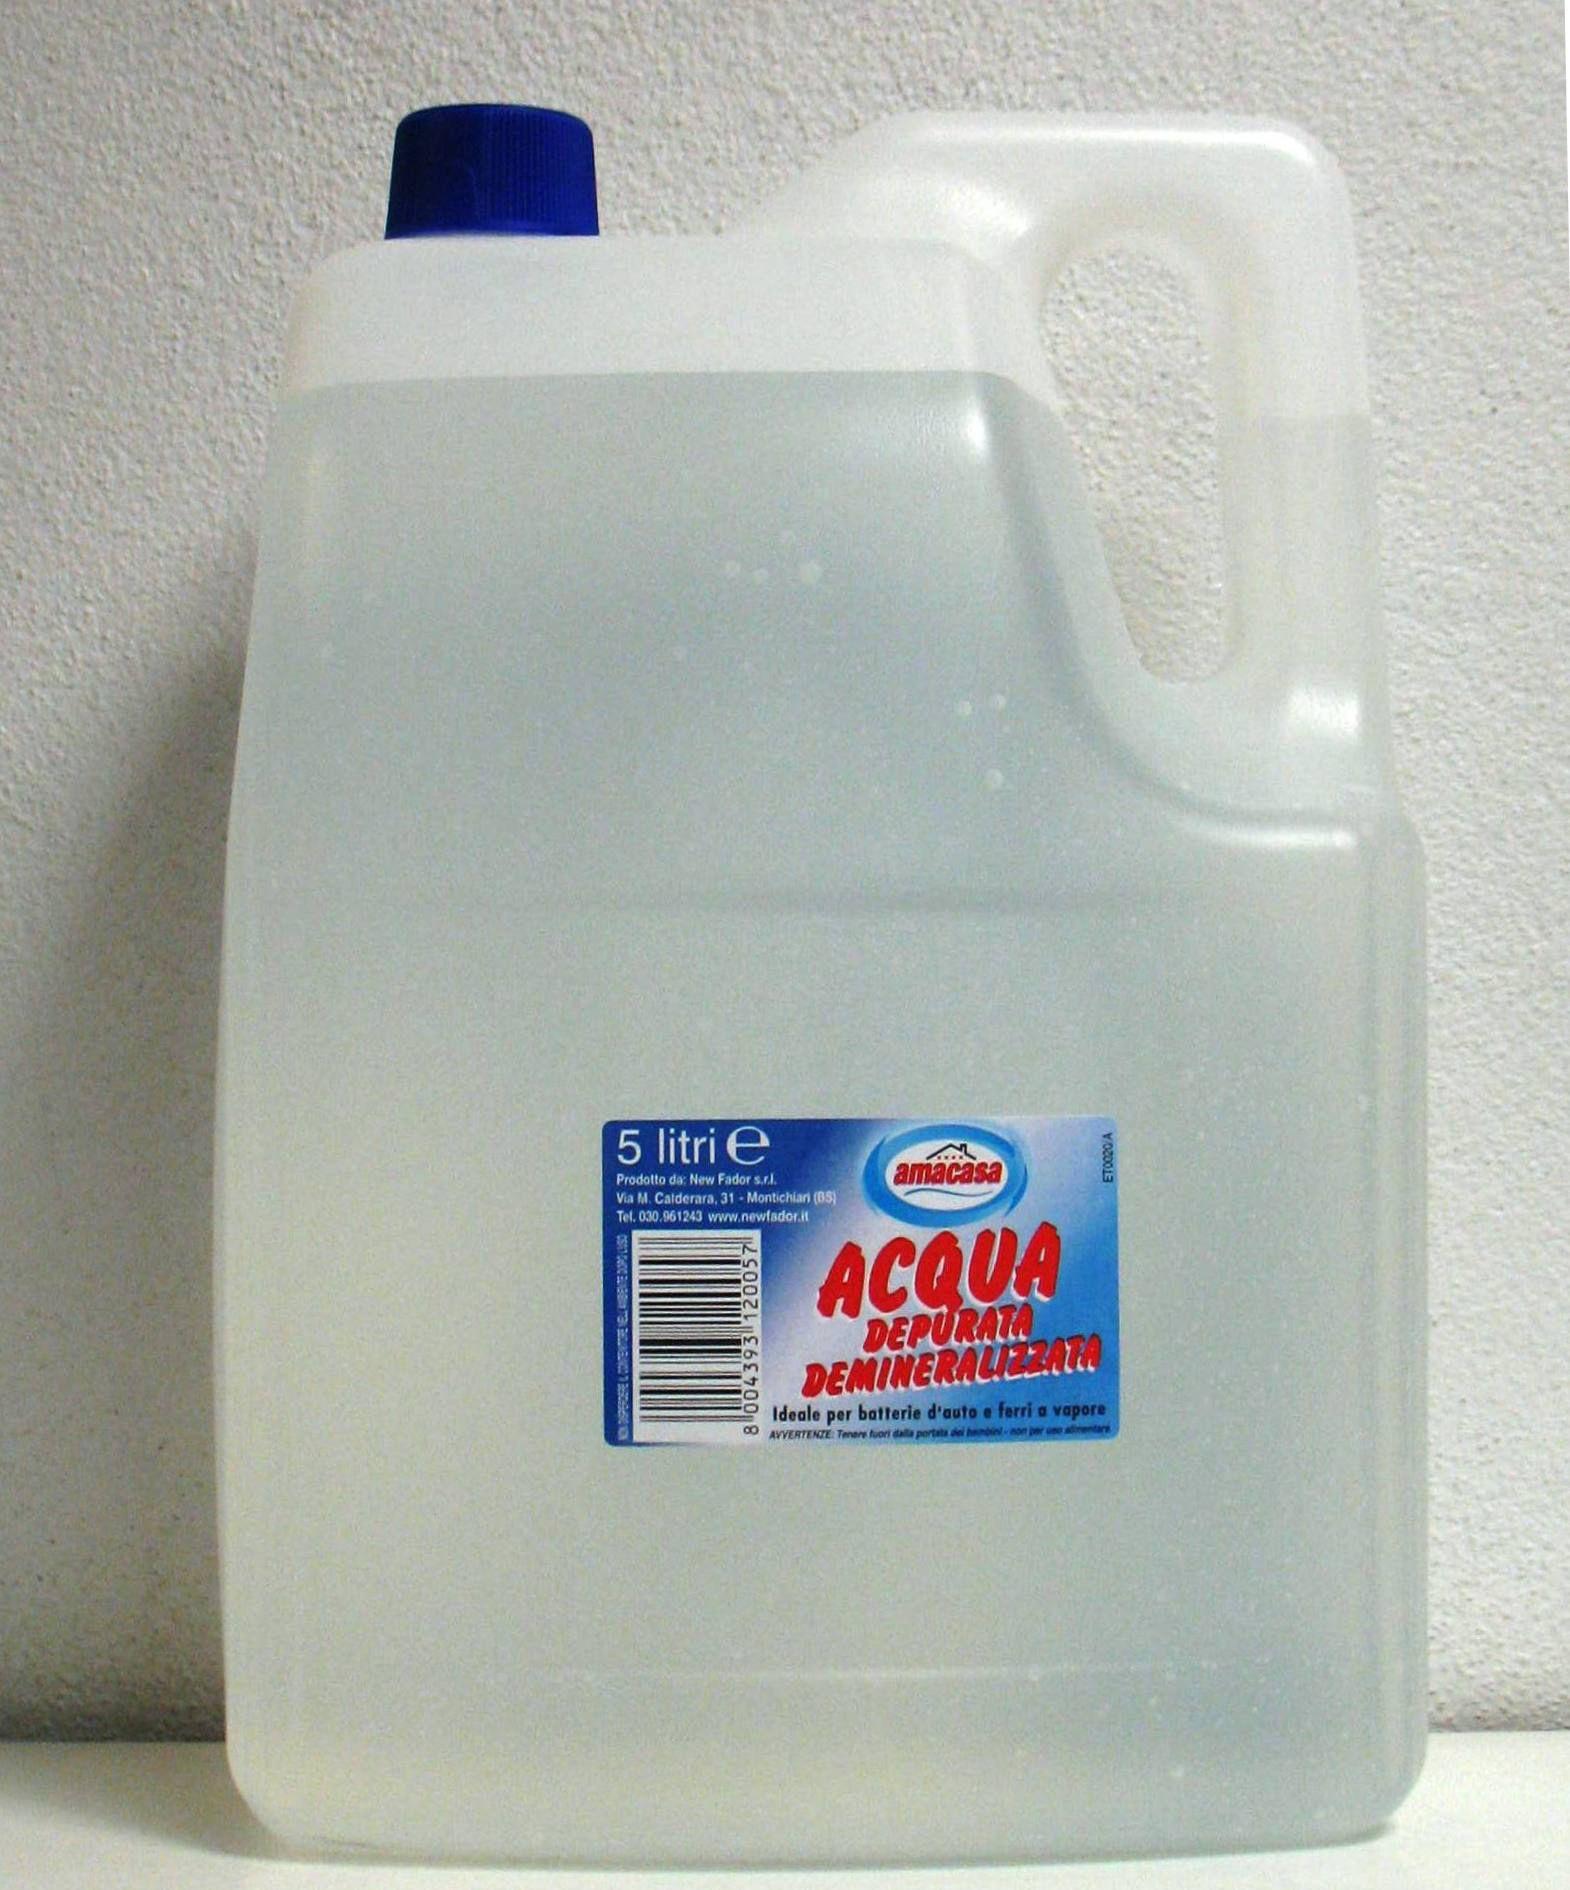 Acqua demineralizzata 5lt amacasa 2H.5004 8004393120057